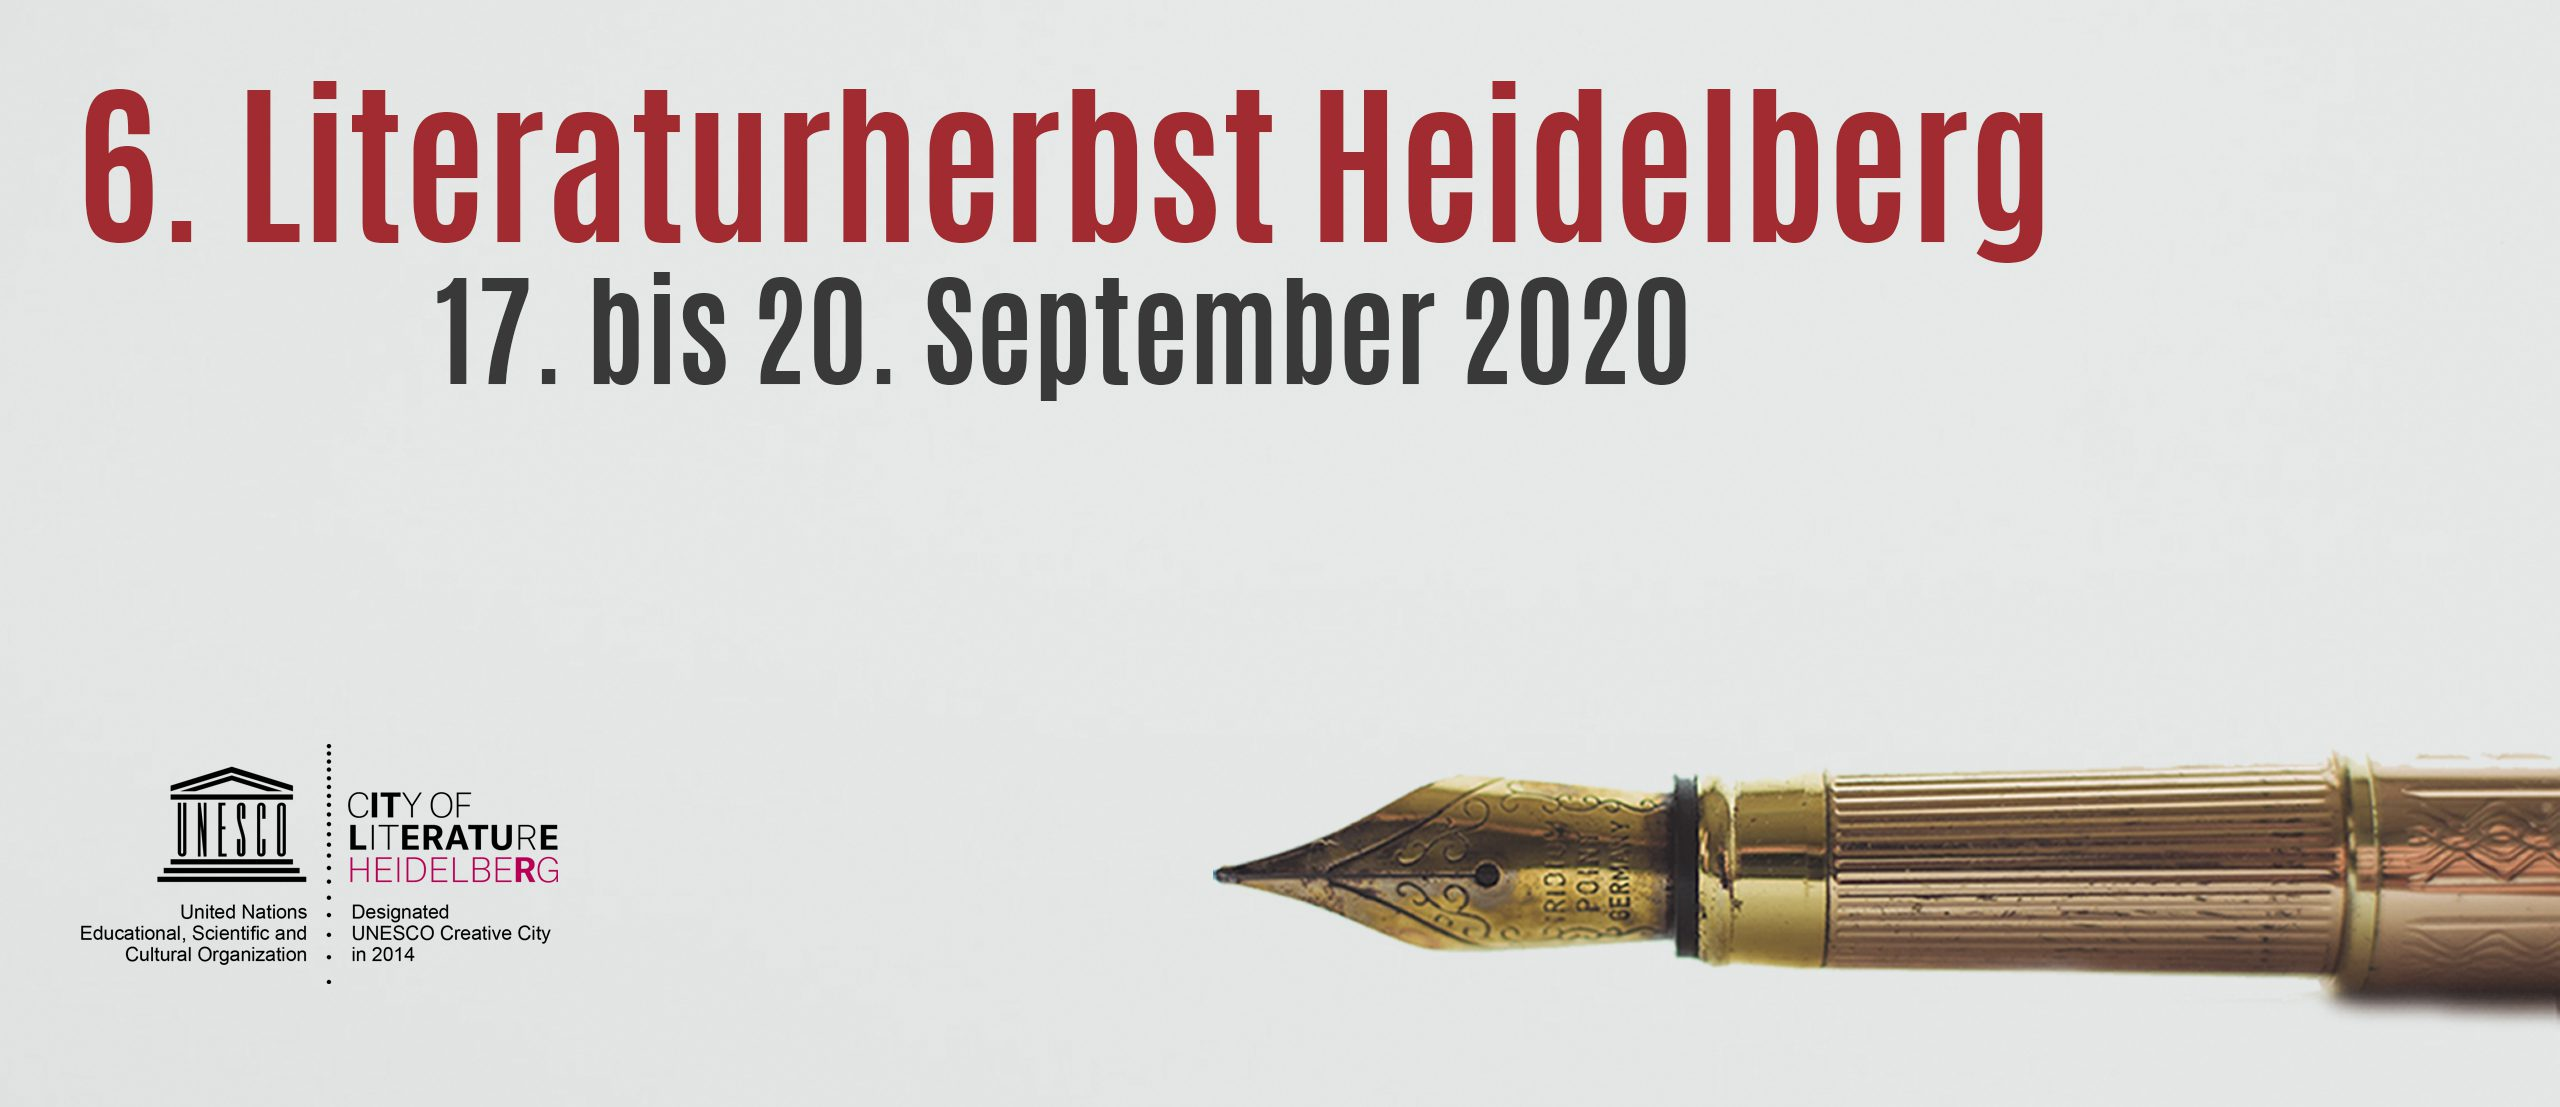 20. Literaturherbst 20 – Literaturherbst Heidelberg